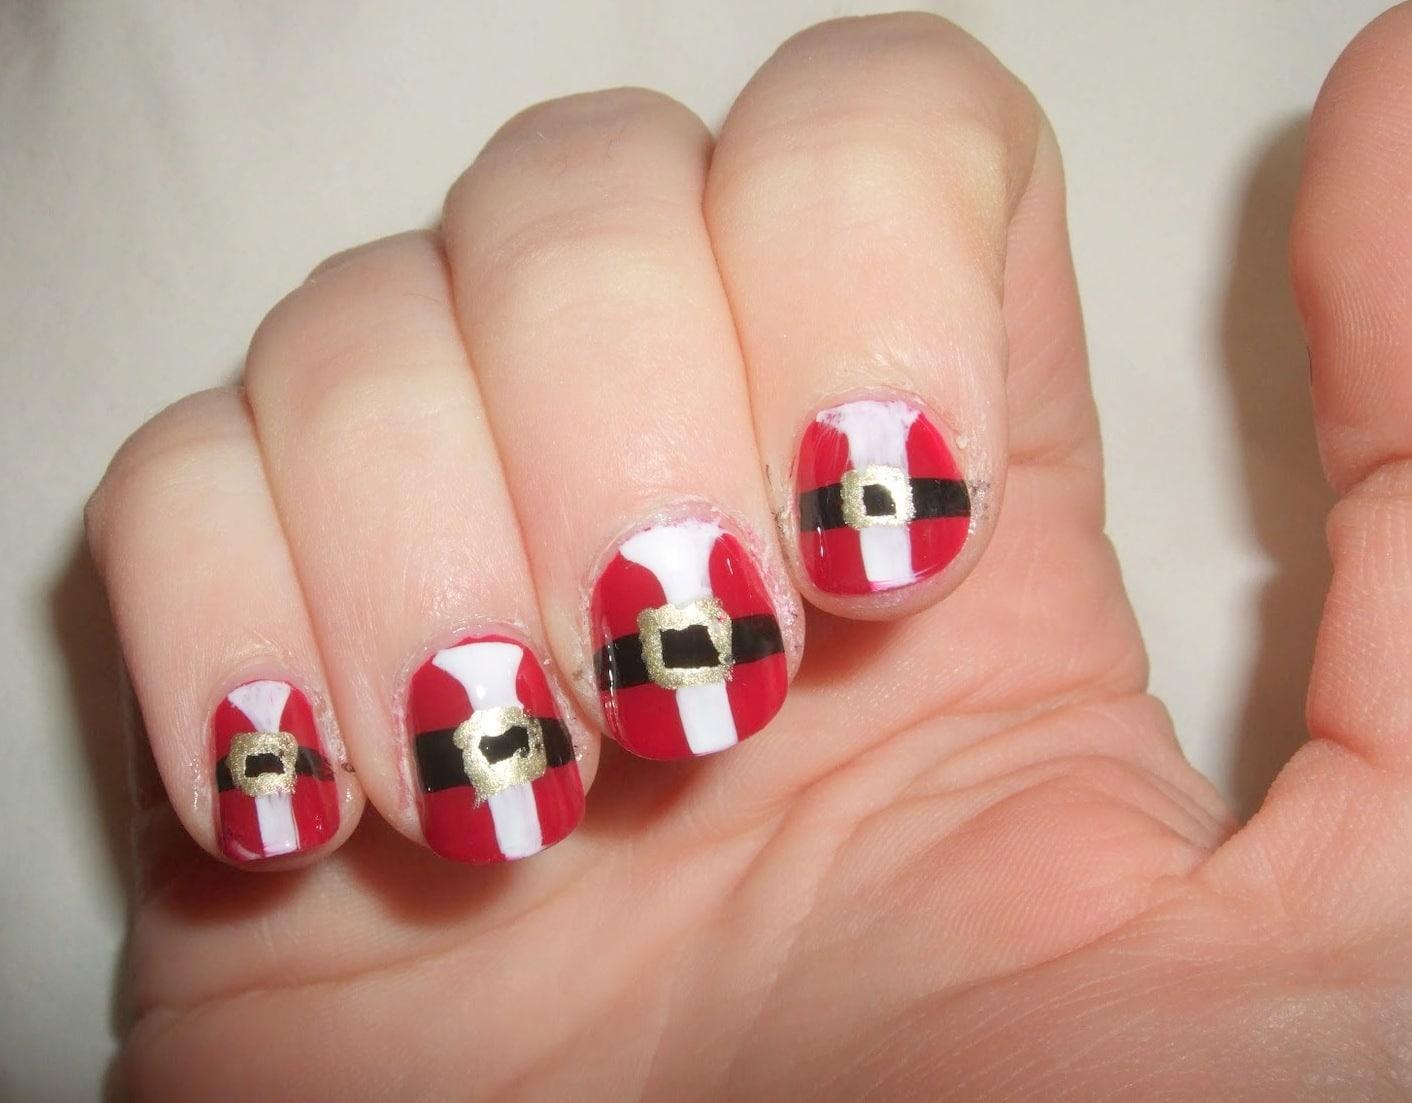 Simple nail art Idea